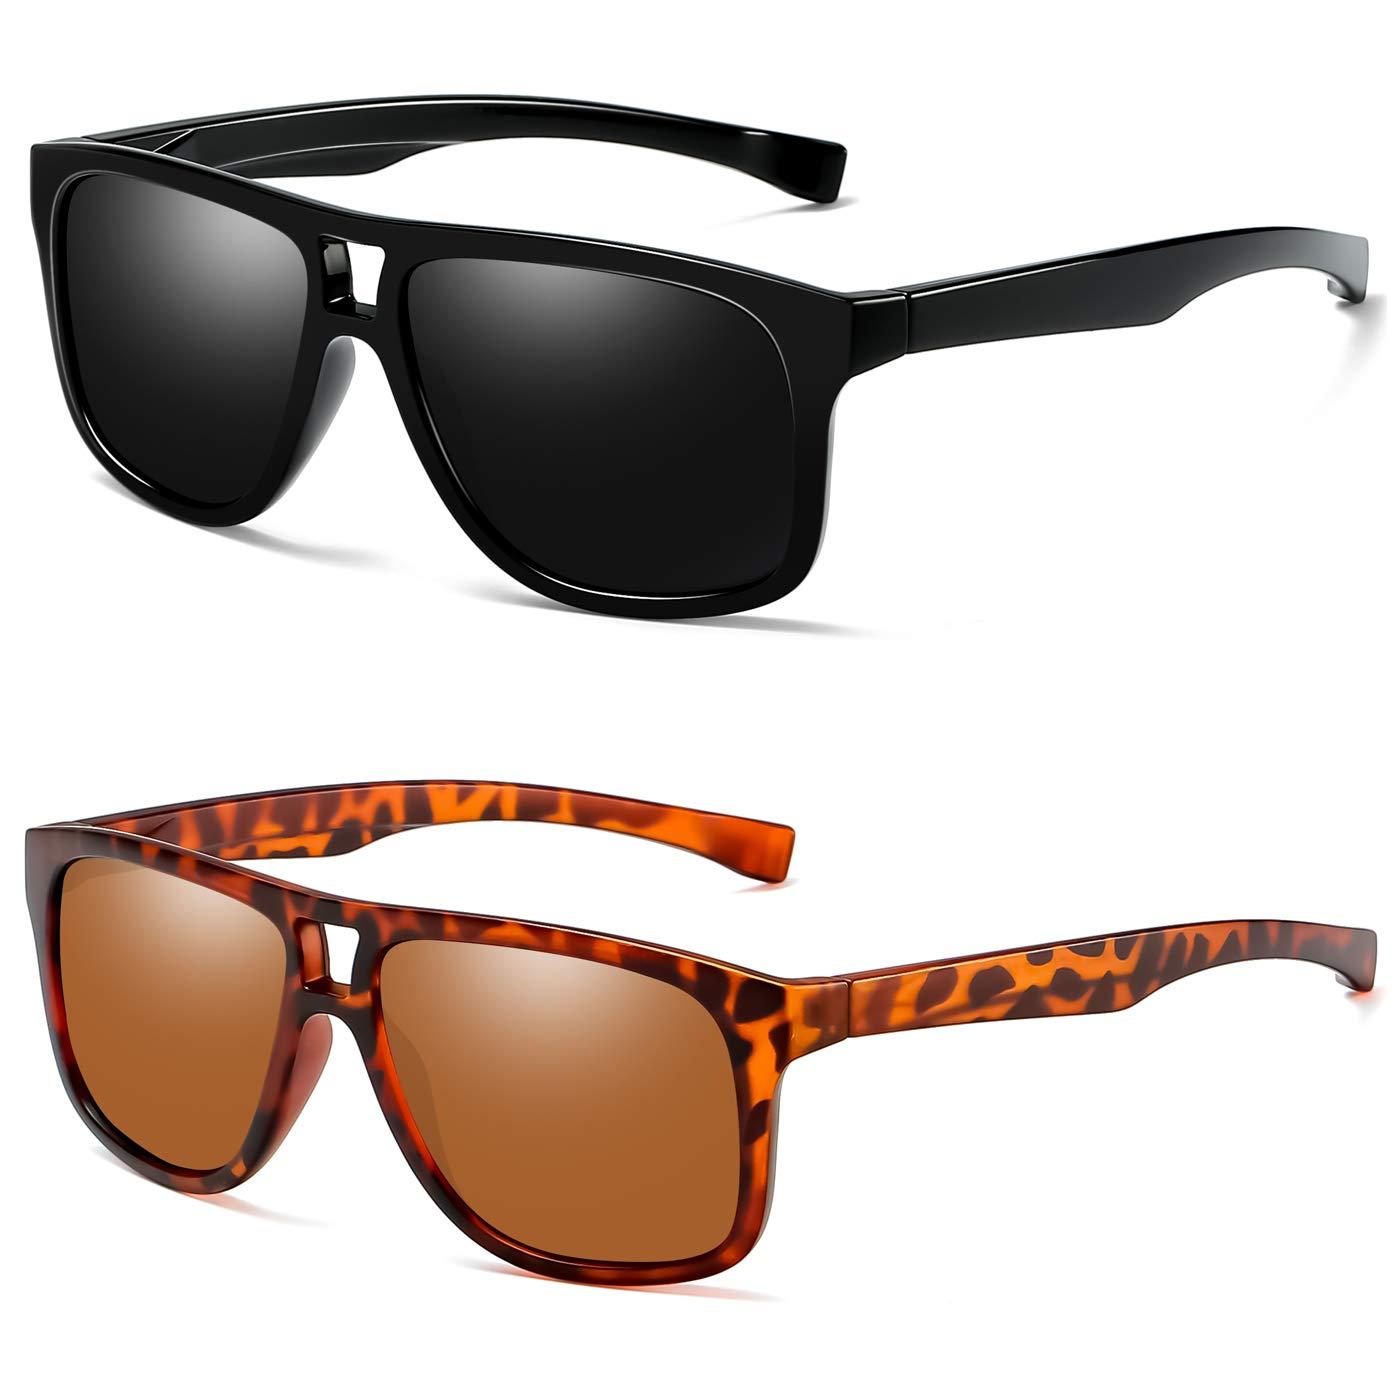 Joopin Fashion Oversized Mens Sunglasses Polarized - 100% UV Protection Retro Sunglasses for Women E8943 (Double Bridge 2 Pack) by Joopin